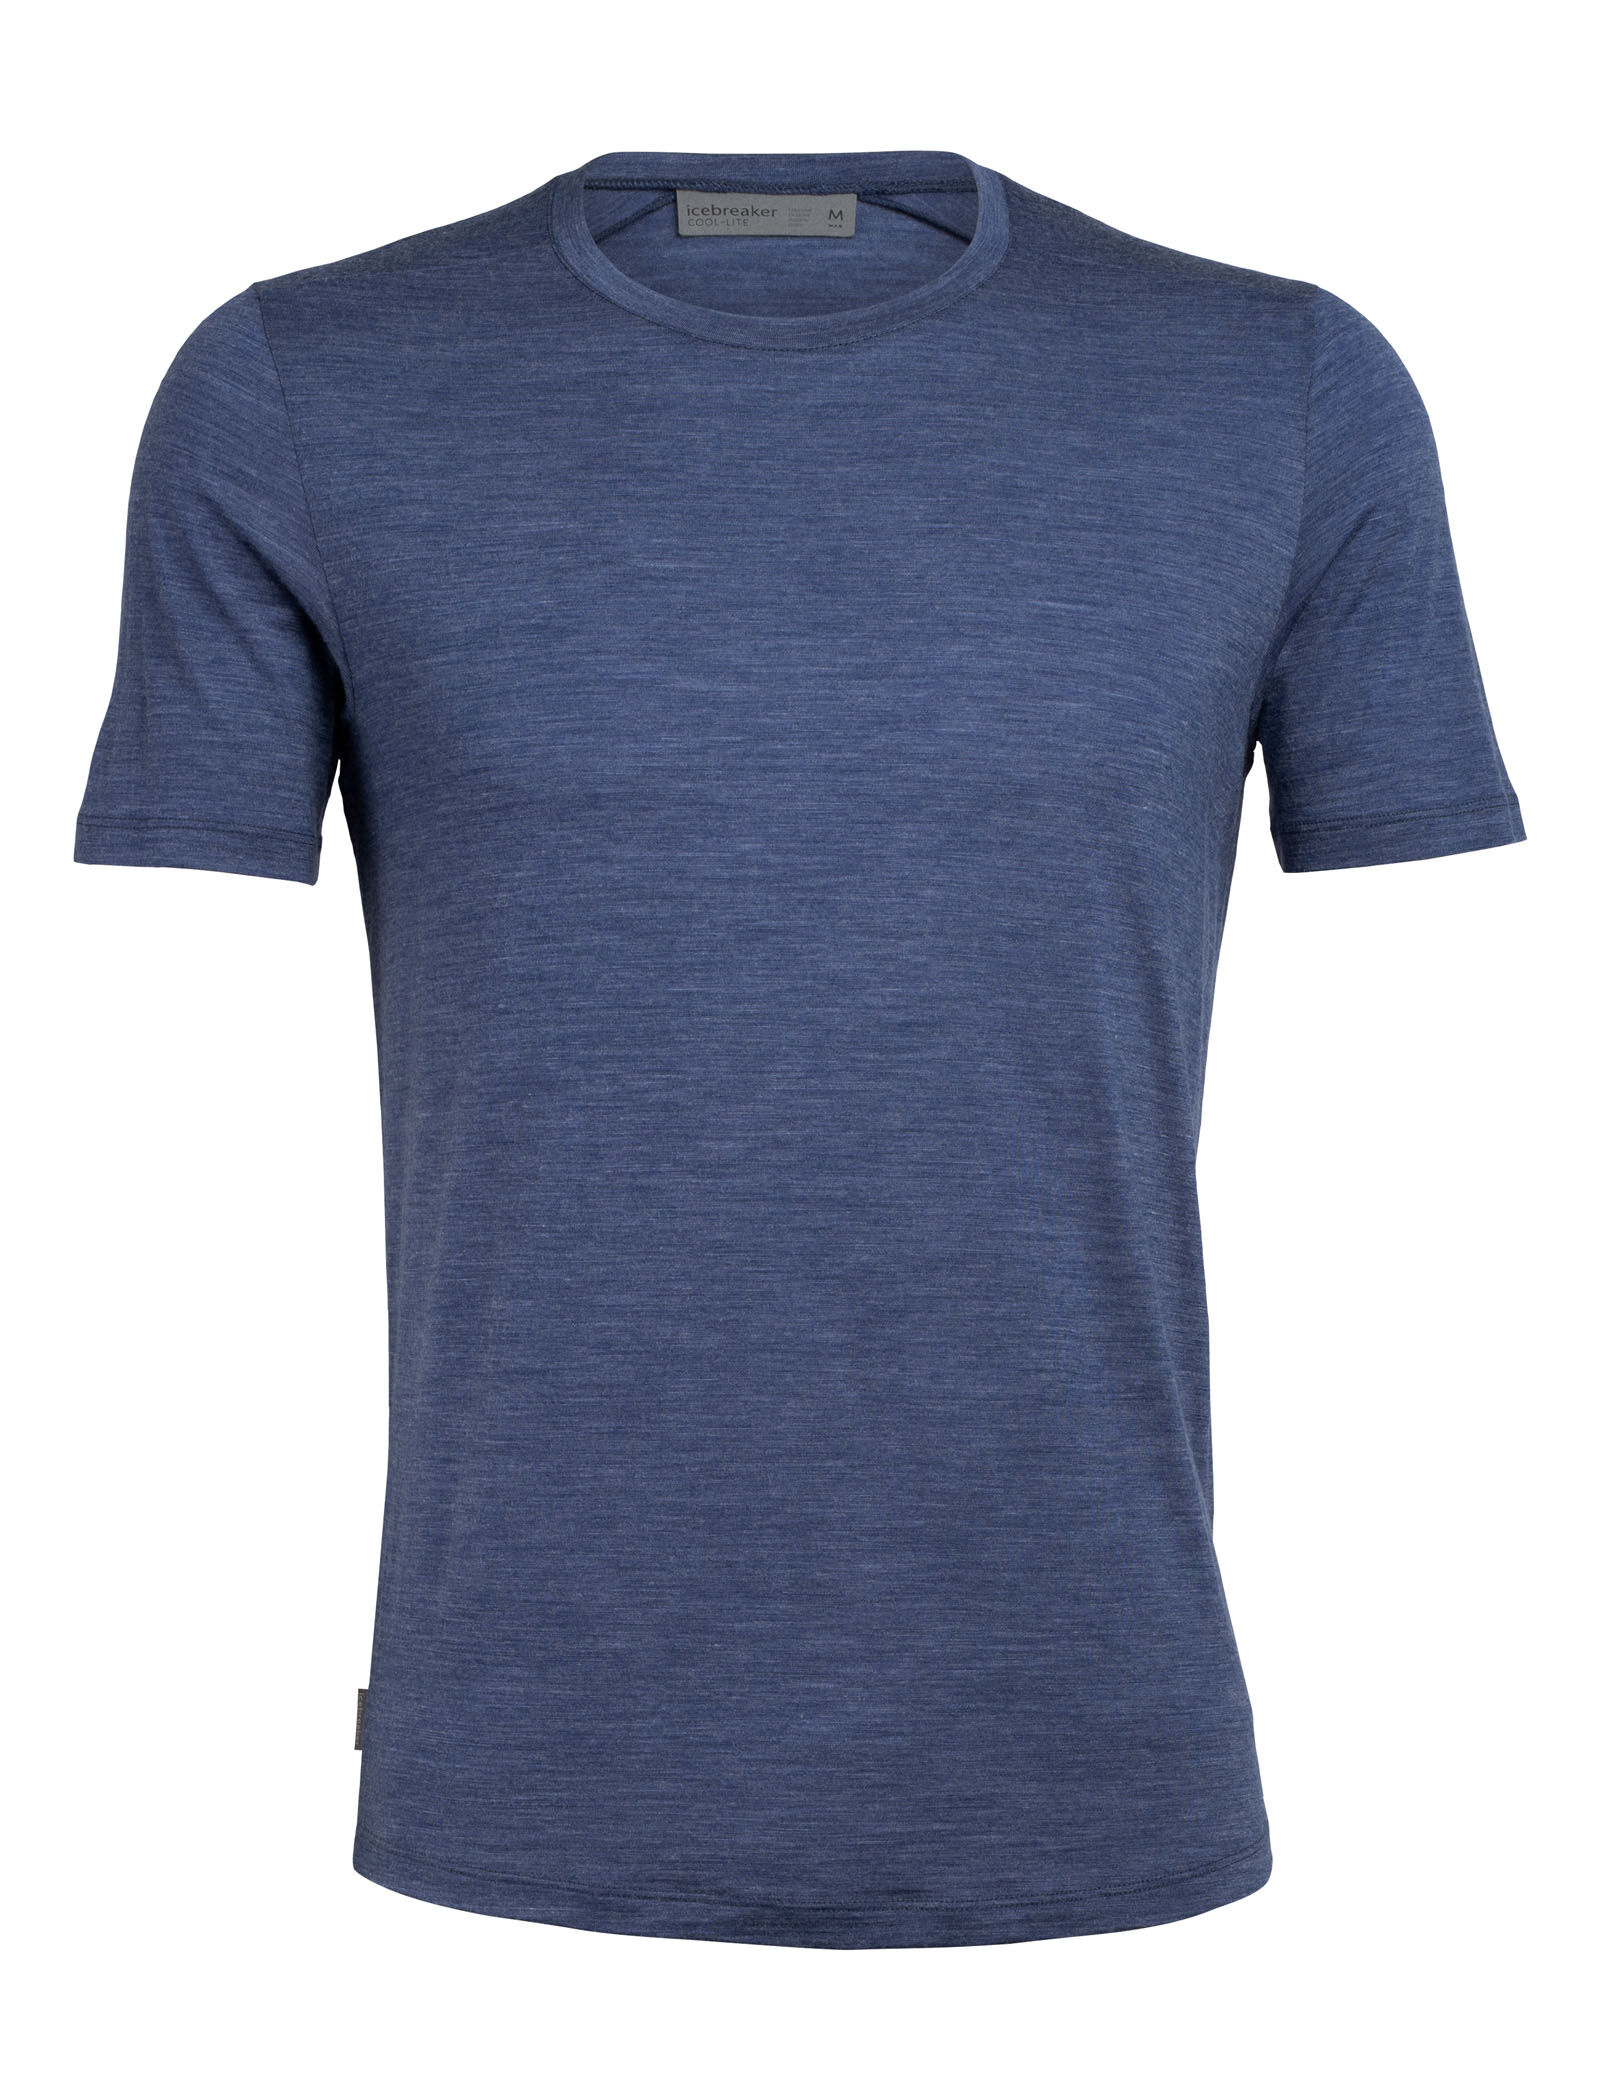 Premium Super Soft Black Short Sleeve Crew T-Shirt American hustler Mens Relentless